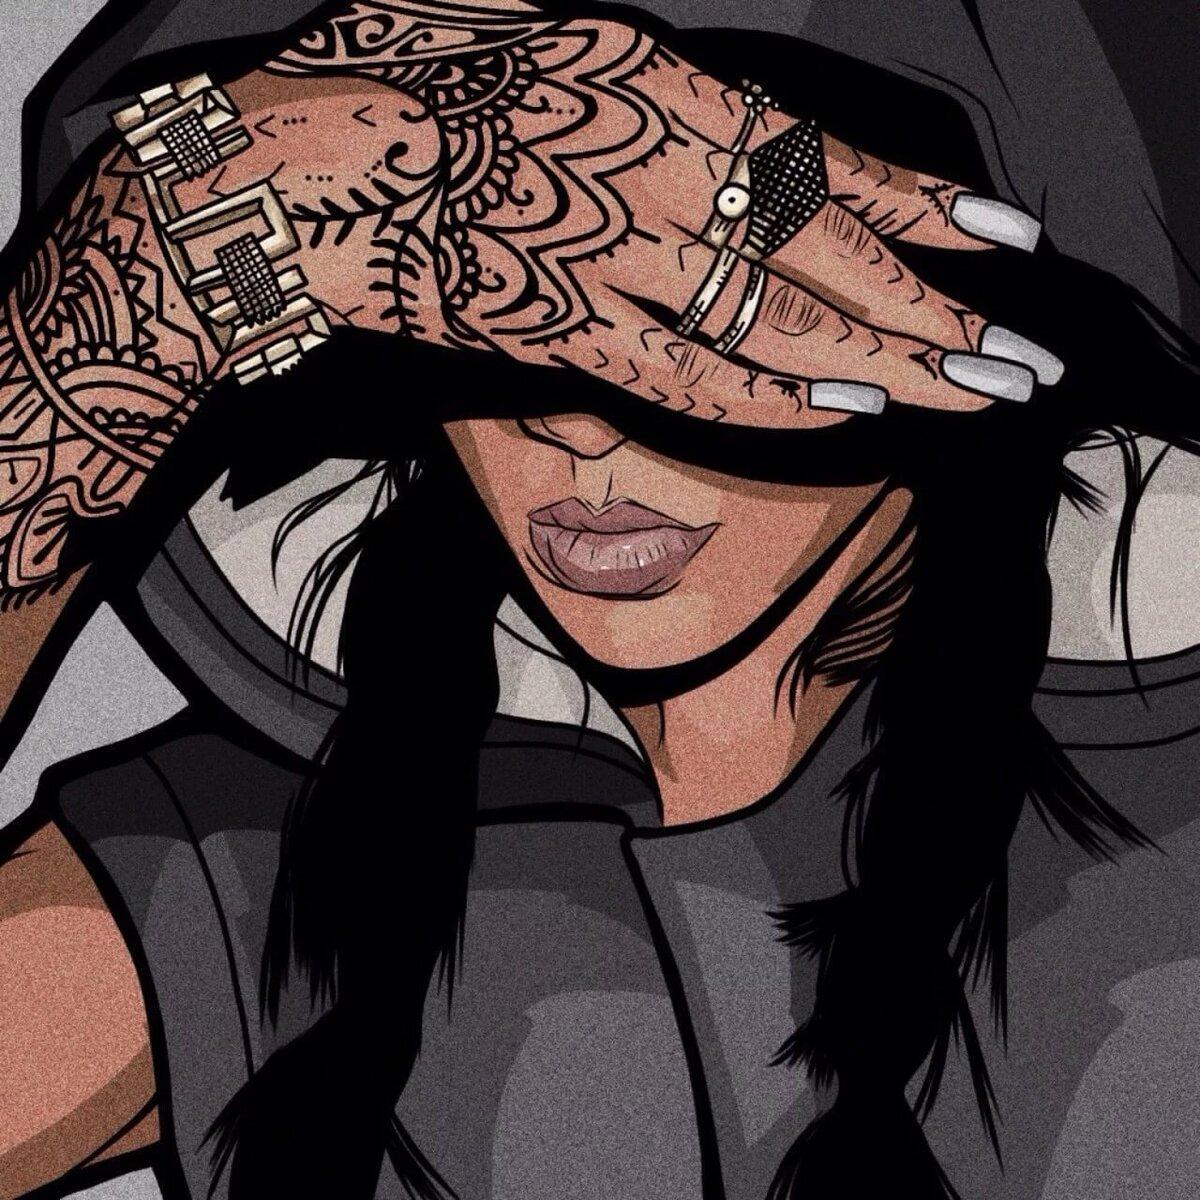 Картинки арт девушки брюнетки с татуировкой